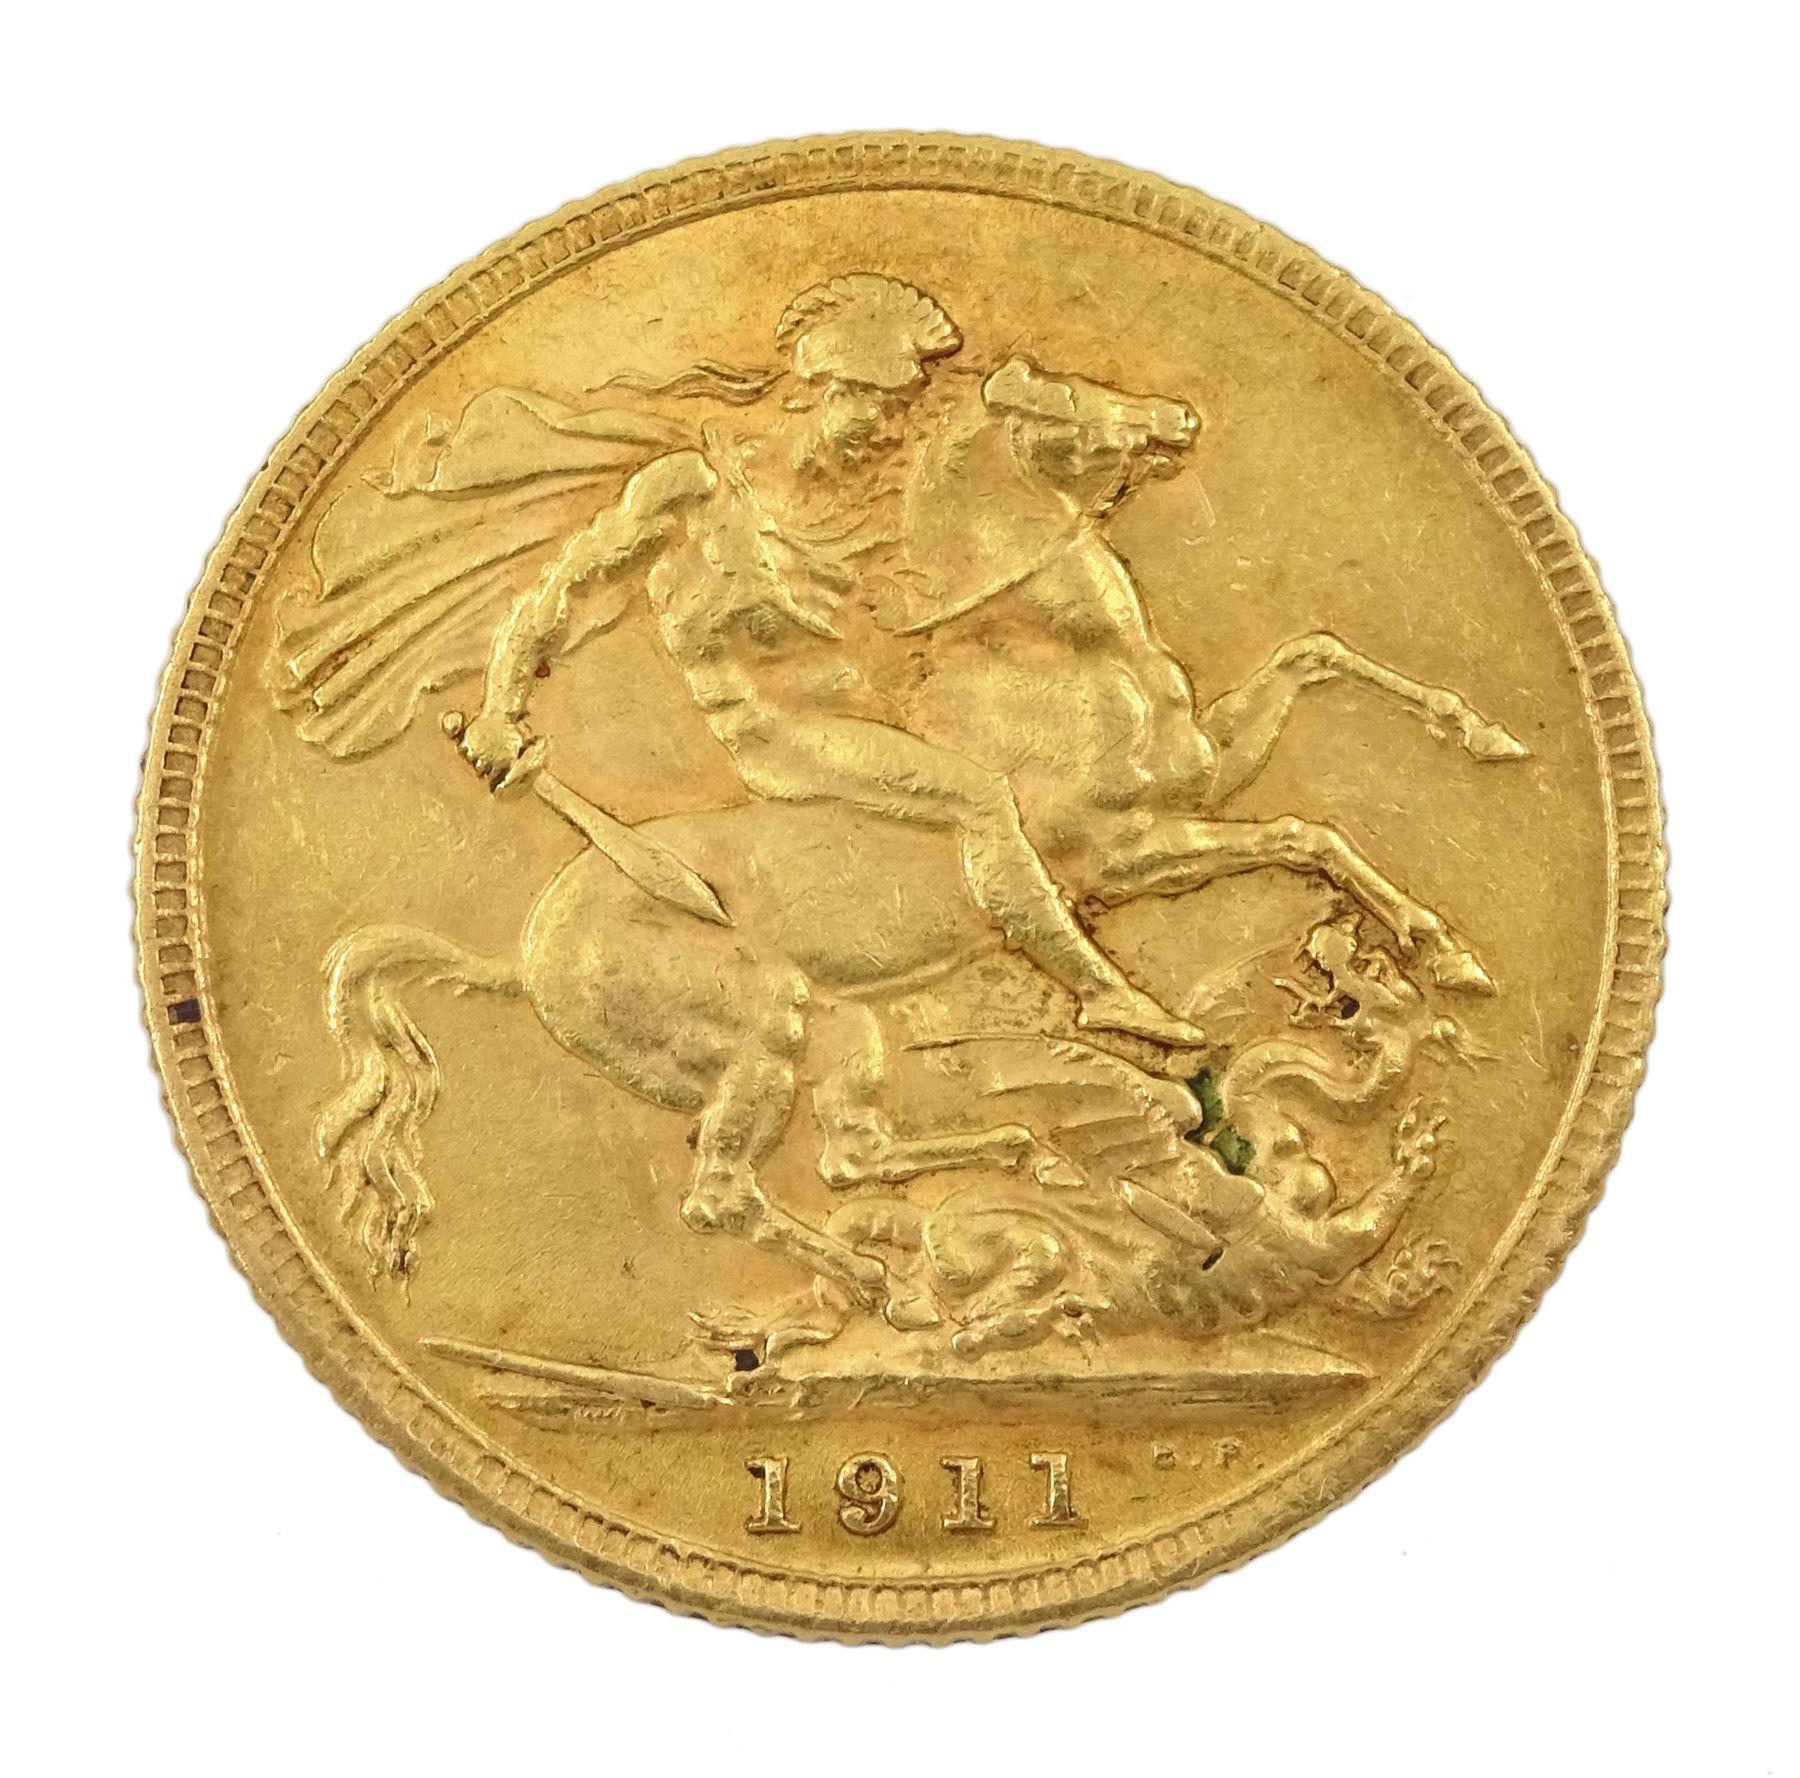 King George V 1911 gold full sovereign coin - Image 2 of 2